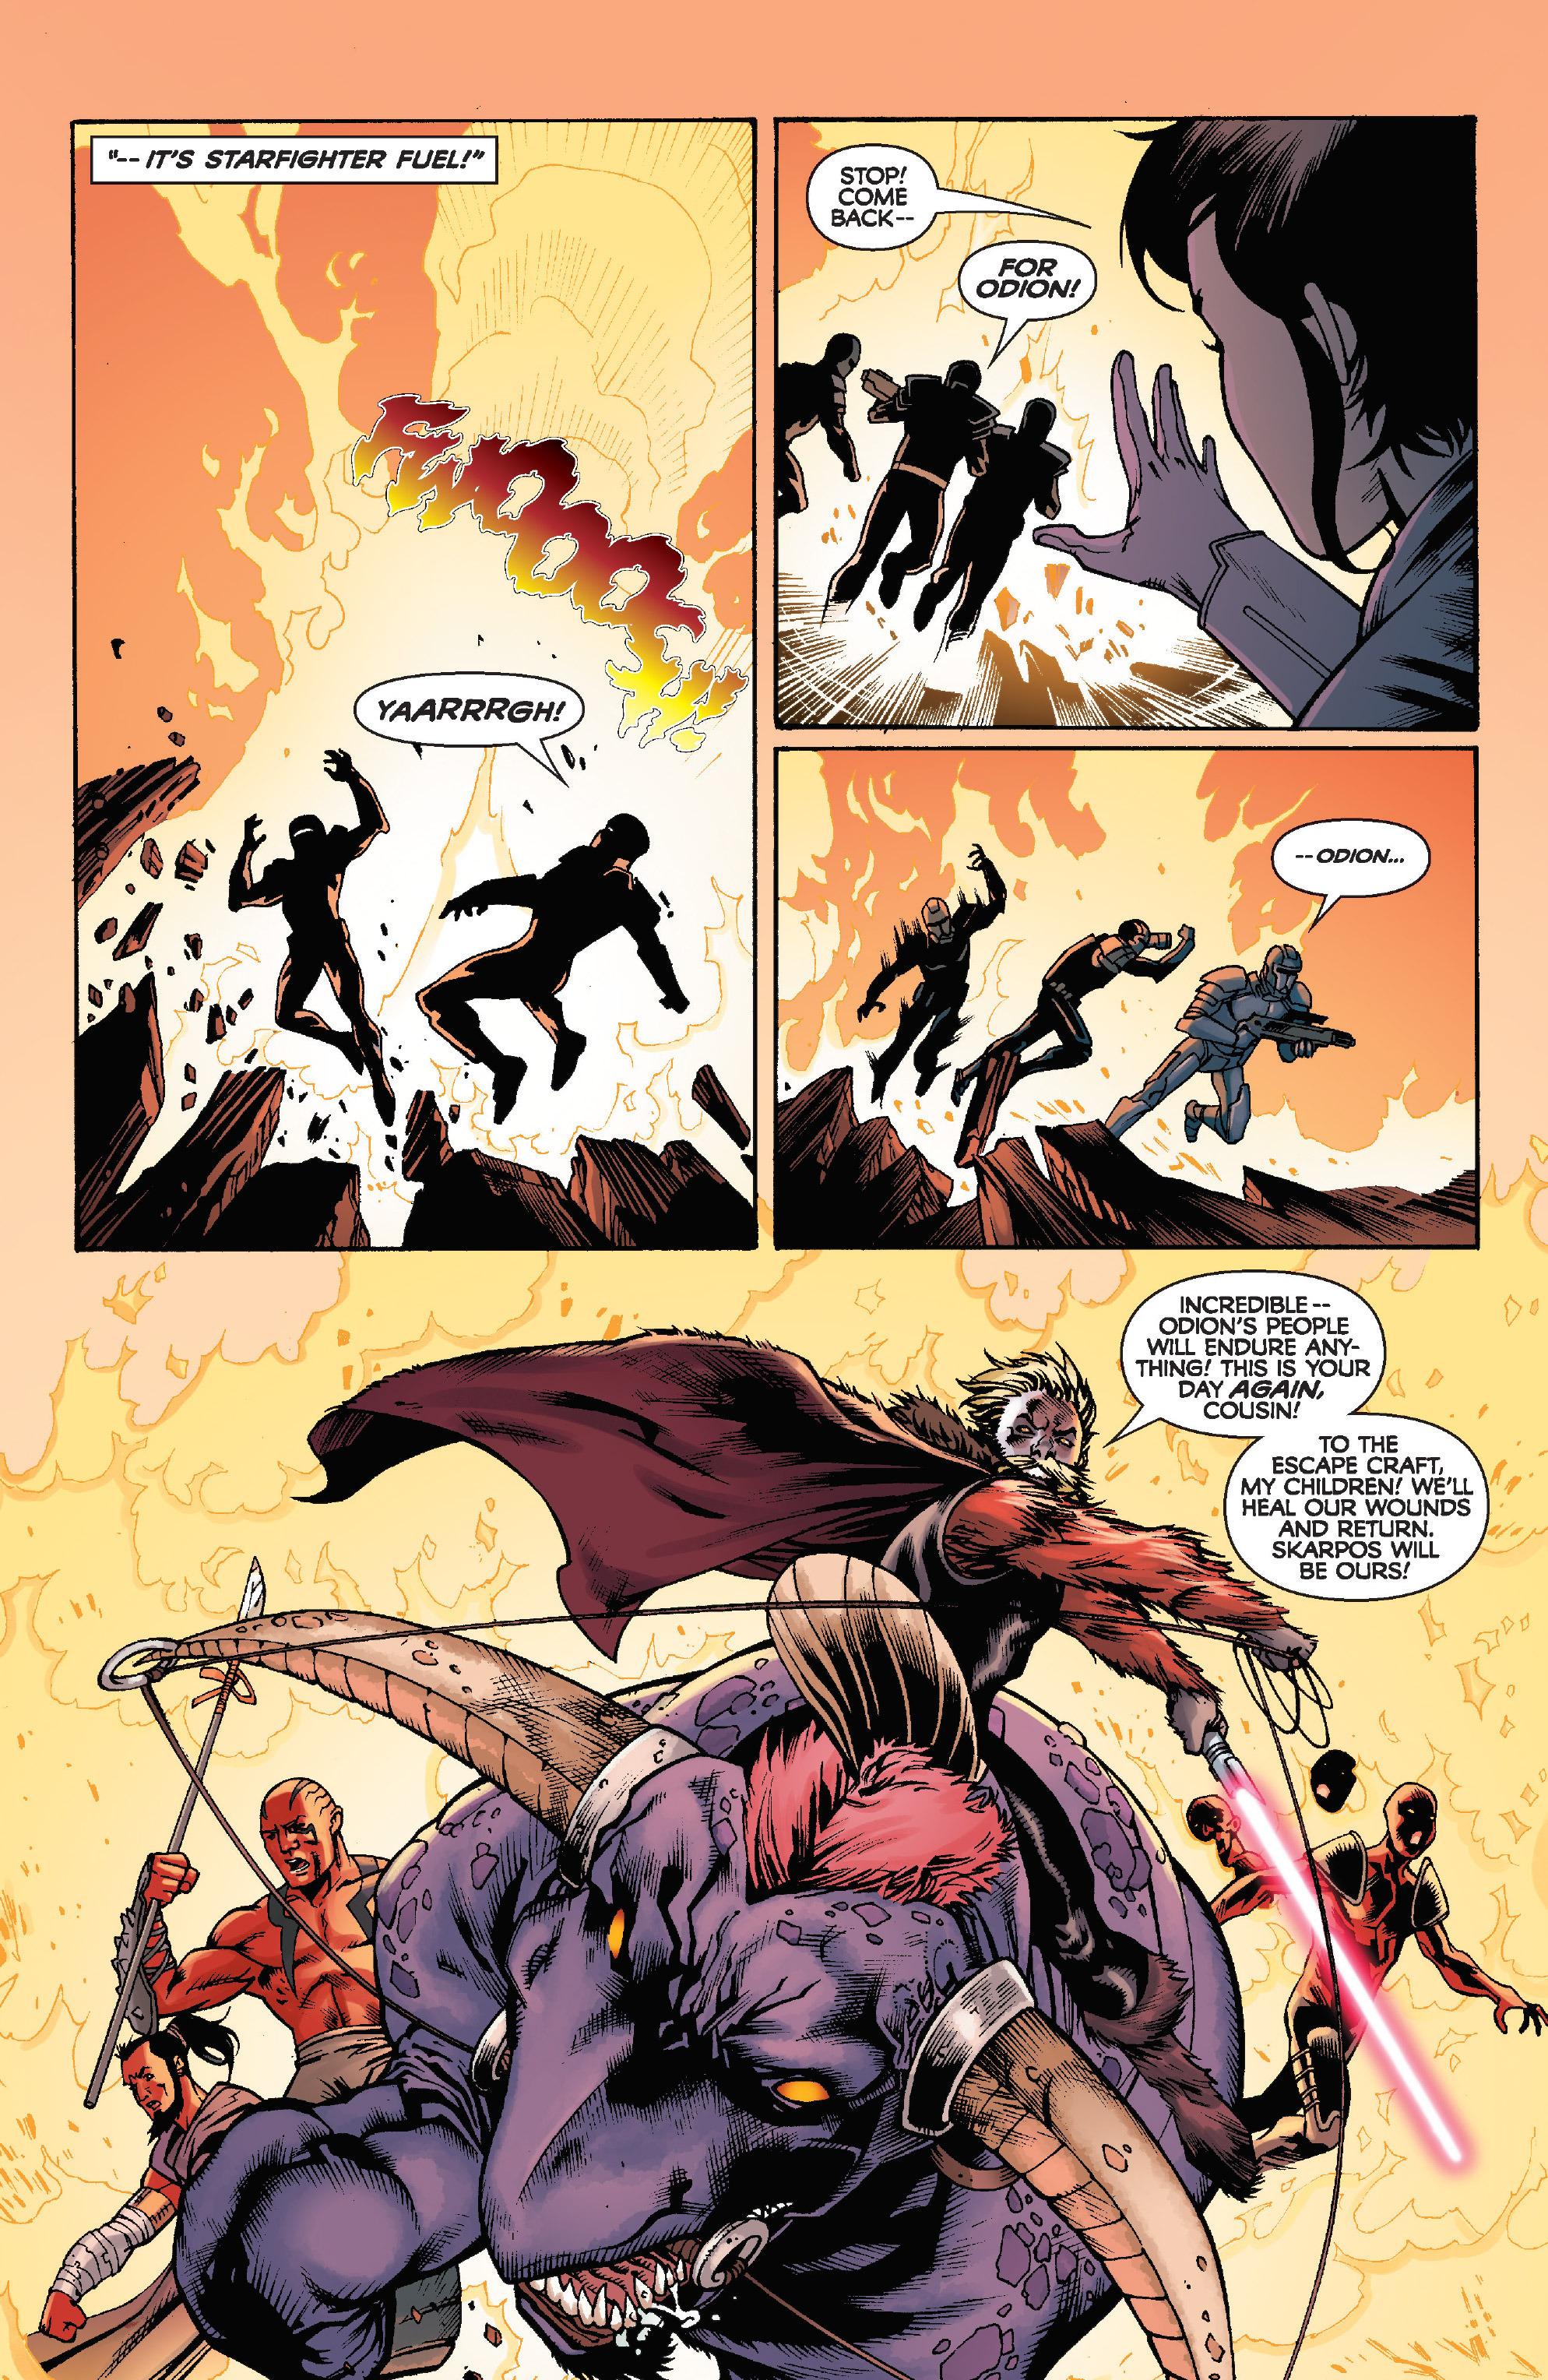 Read online Star Wars: Knight Errant - Escape comic -  Issue #1 - 13